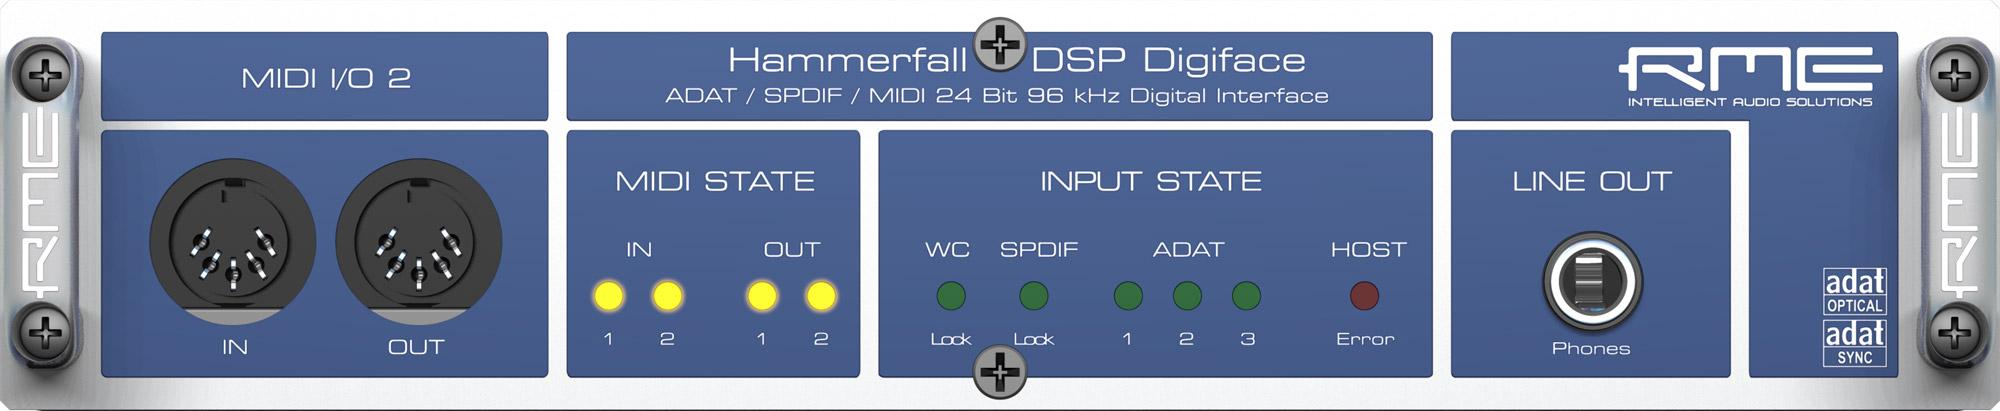 HAMMERFALL DSP DIGIFACE DRIVERS FOR WINDOWS 8